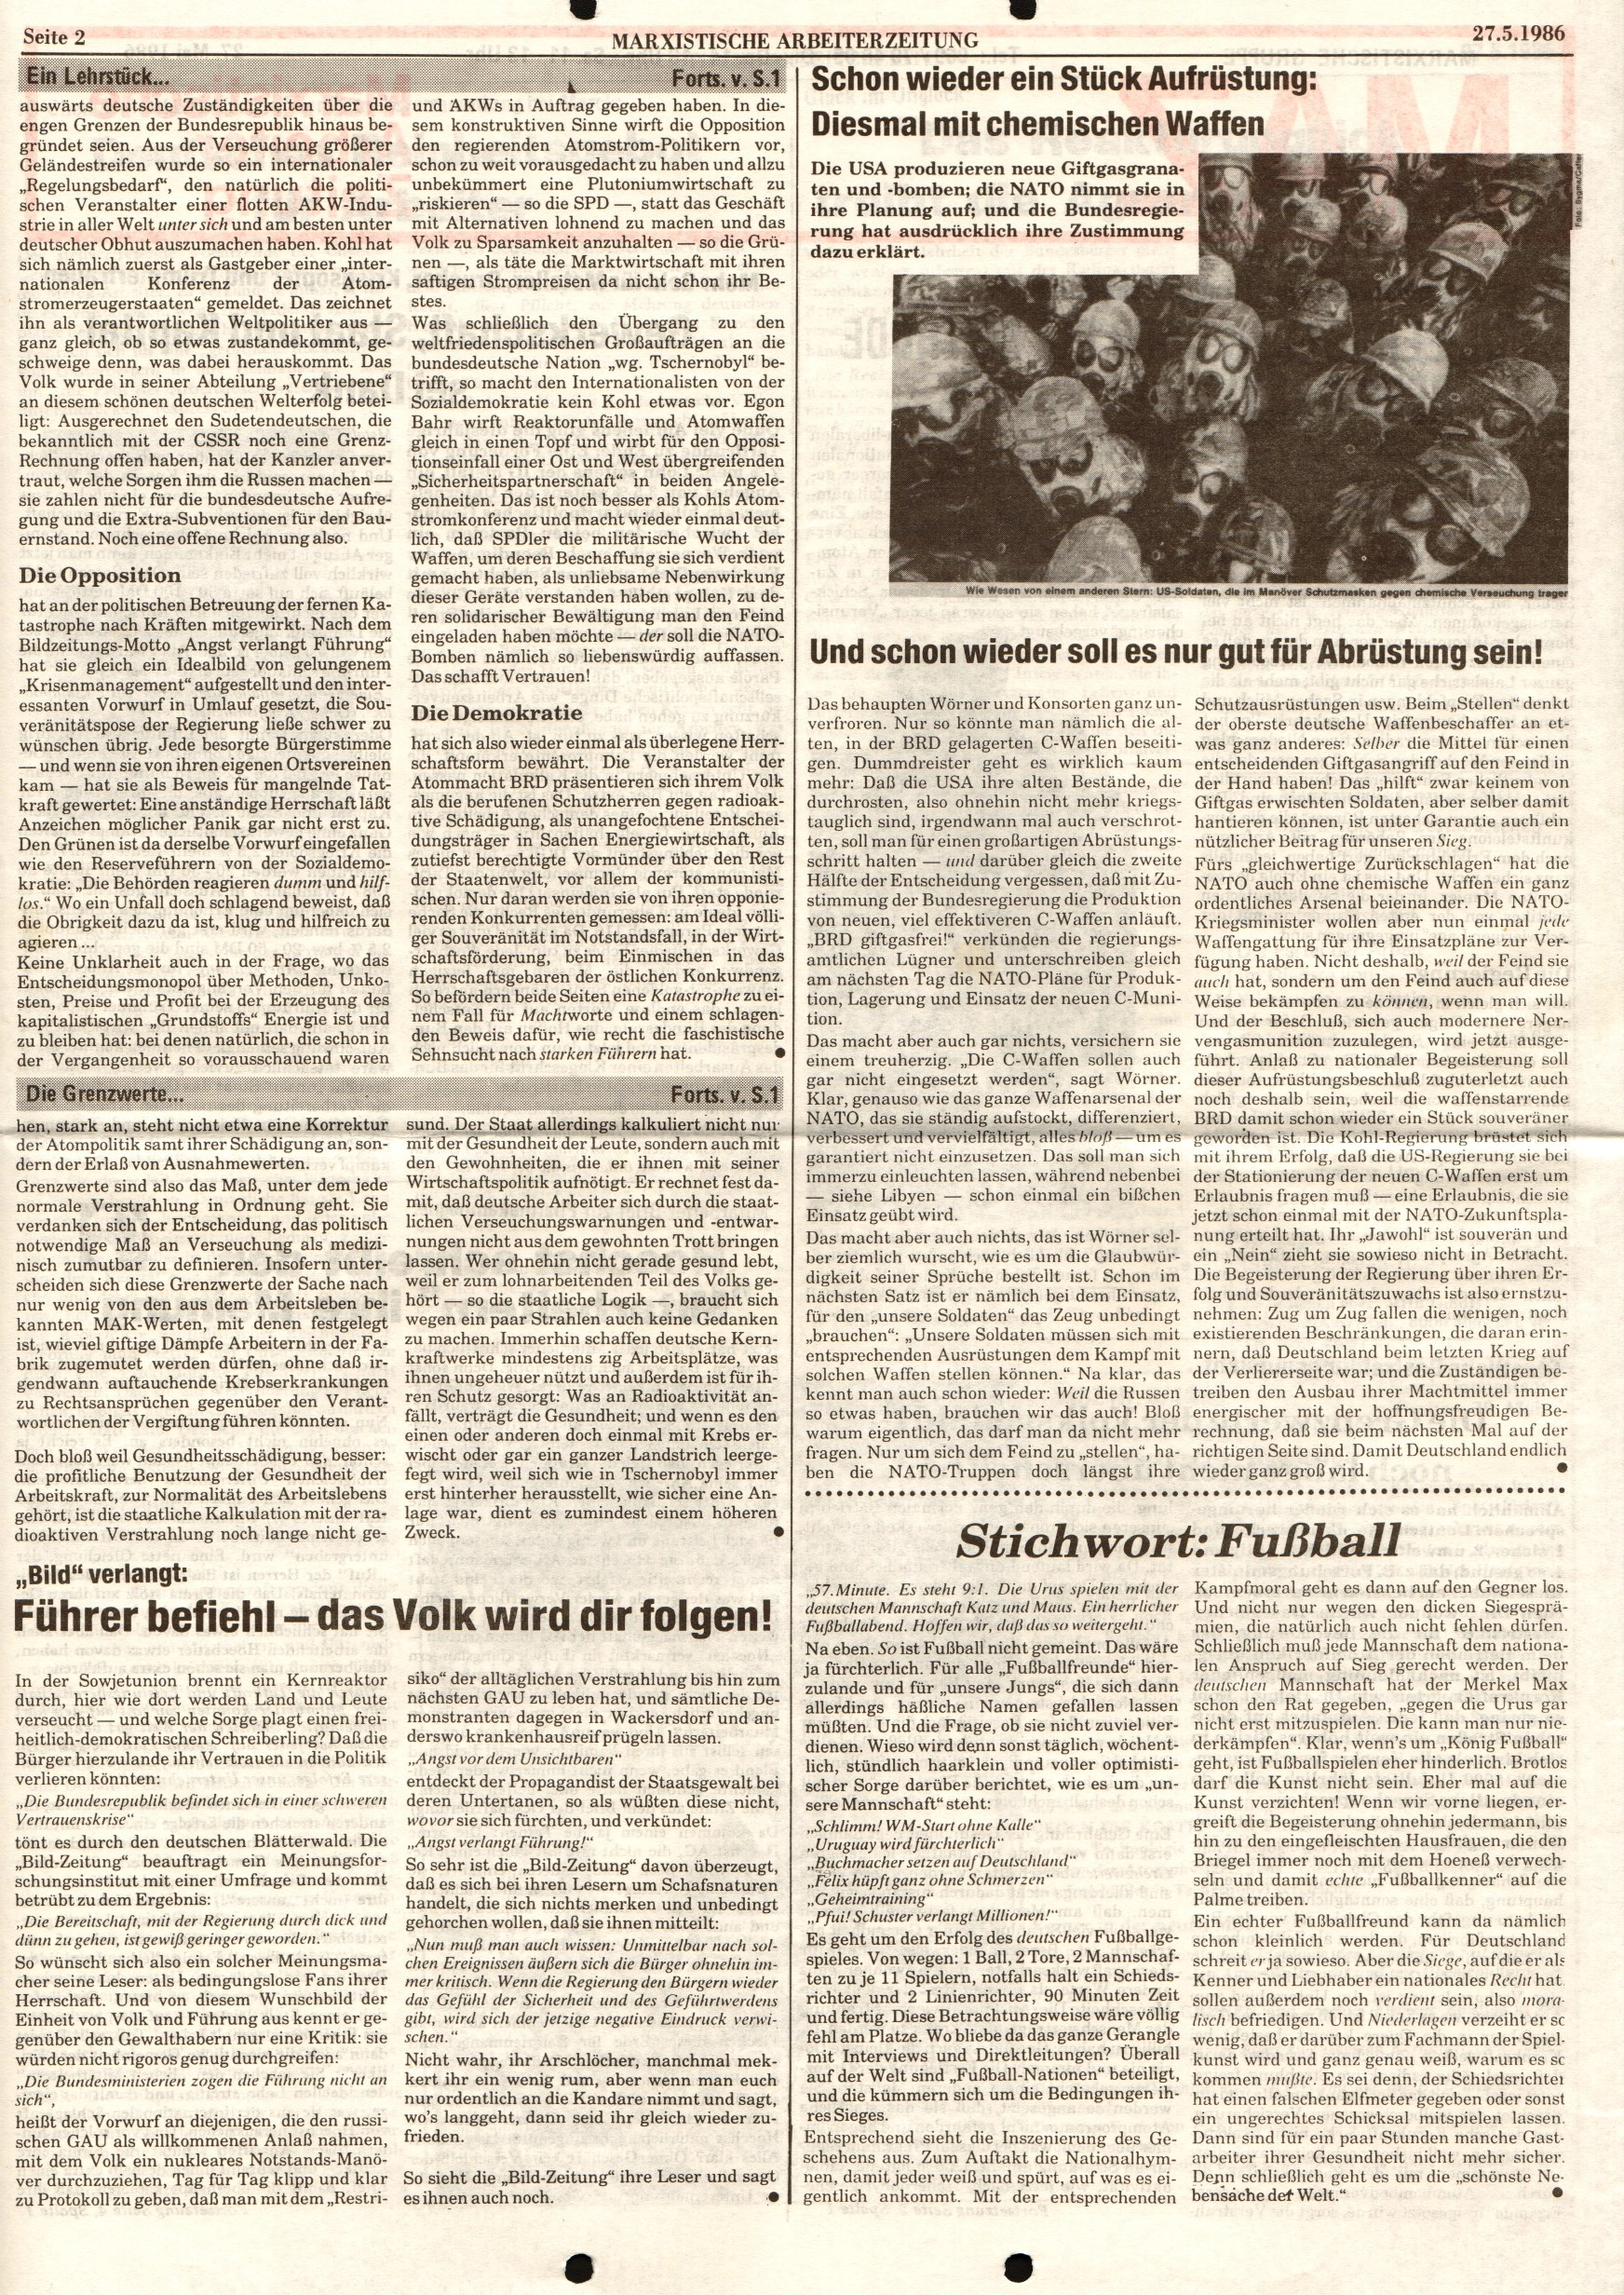 Frankfurt_CPK_Hoechst_MAZ378